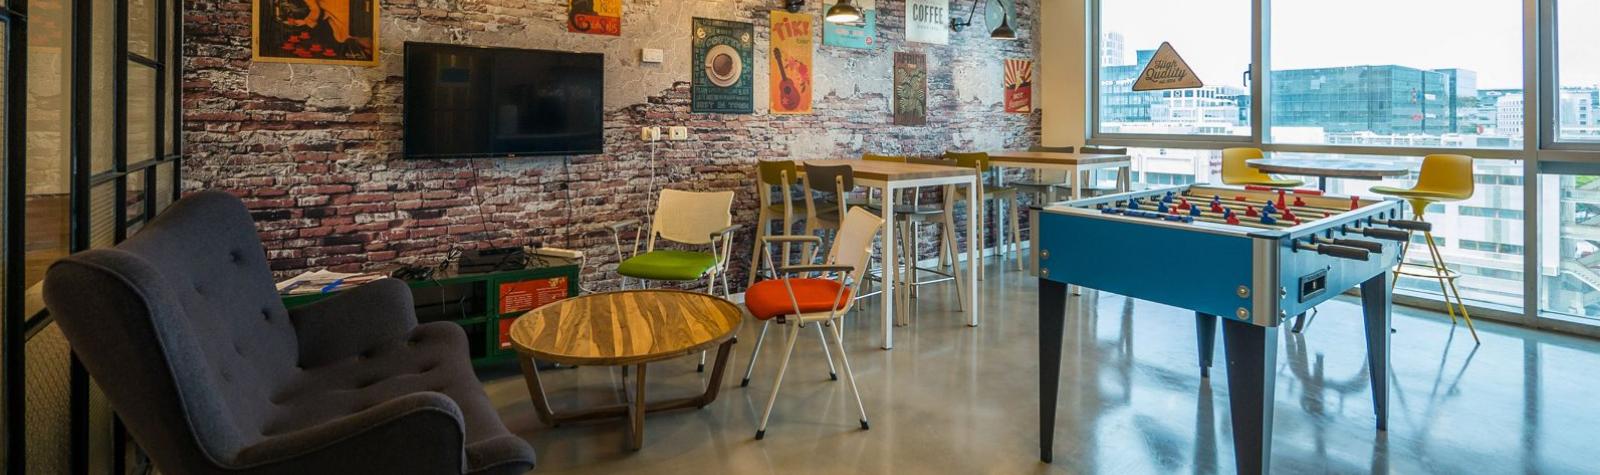 4 Ways to Upgrade and Create the VIP Break Room